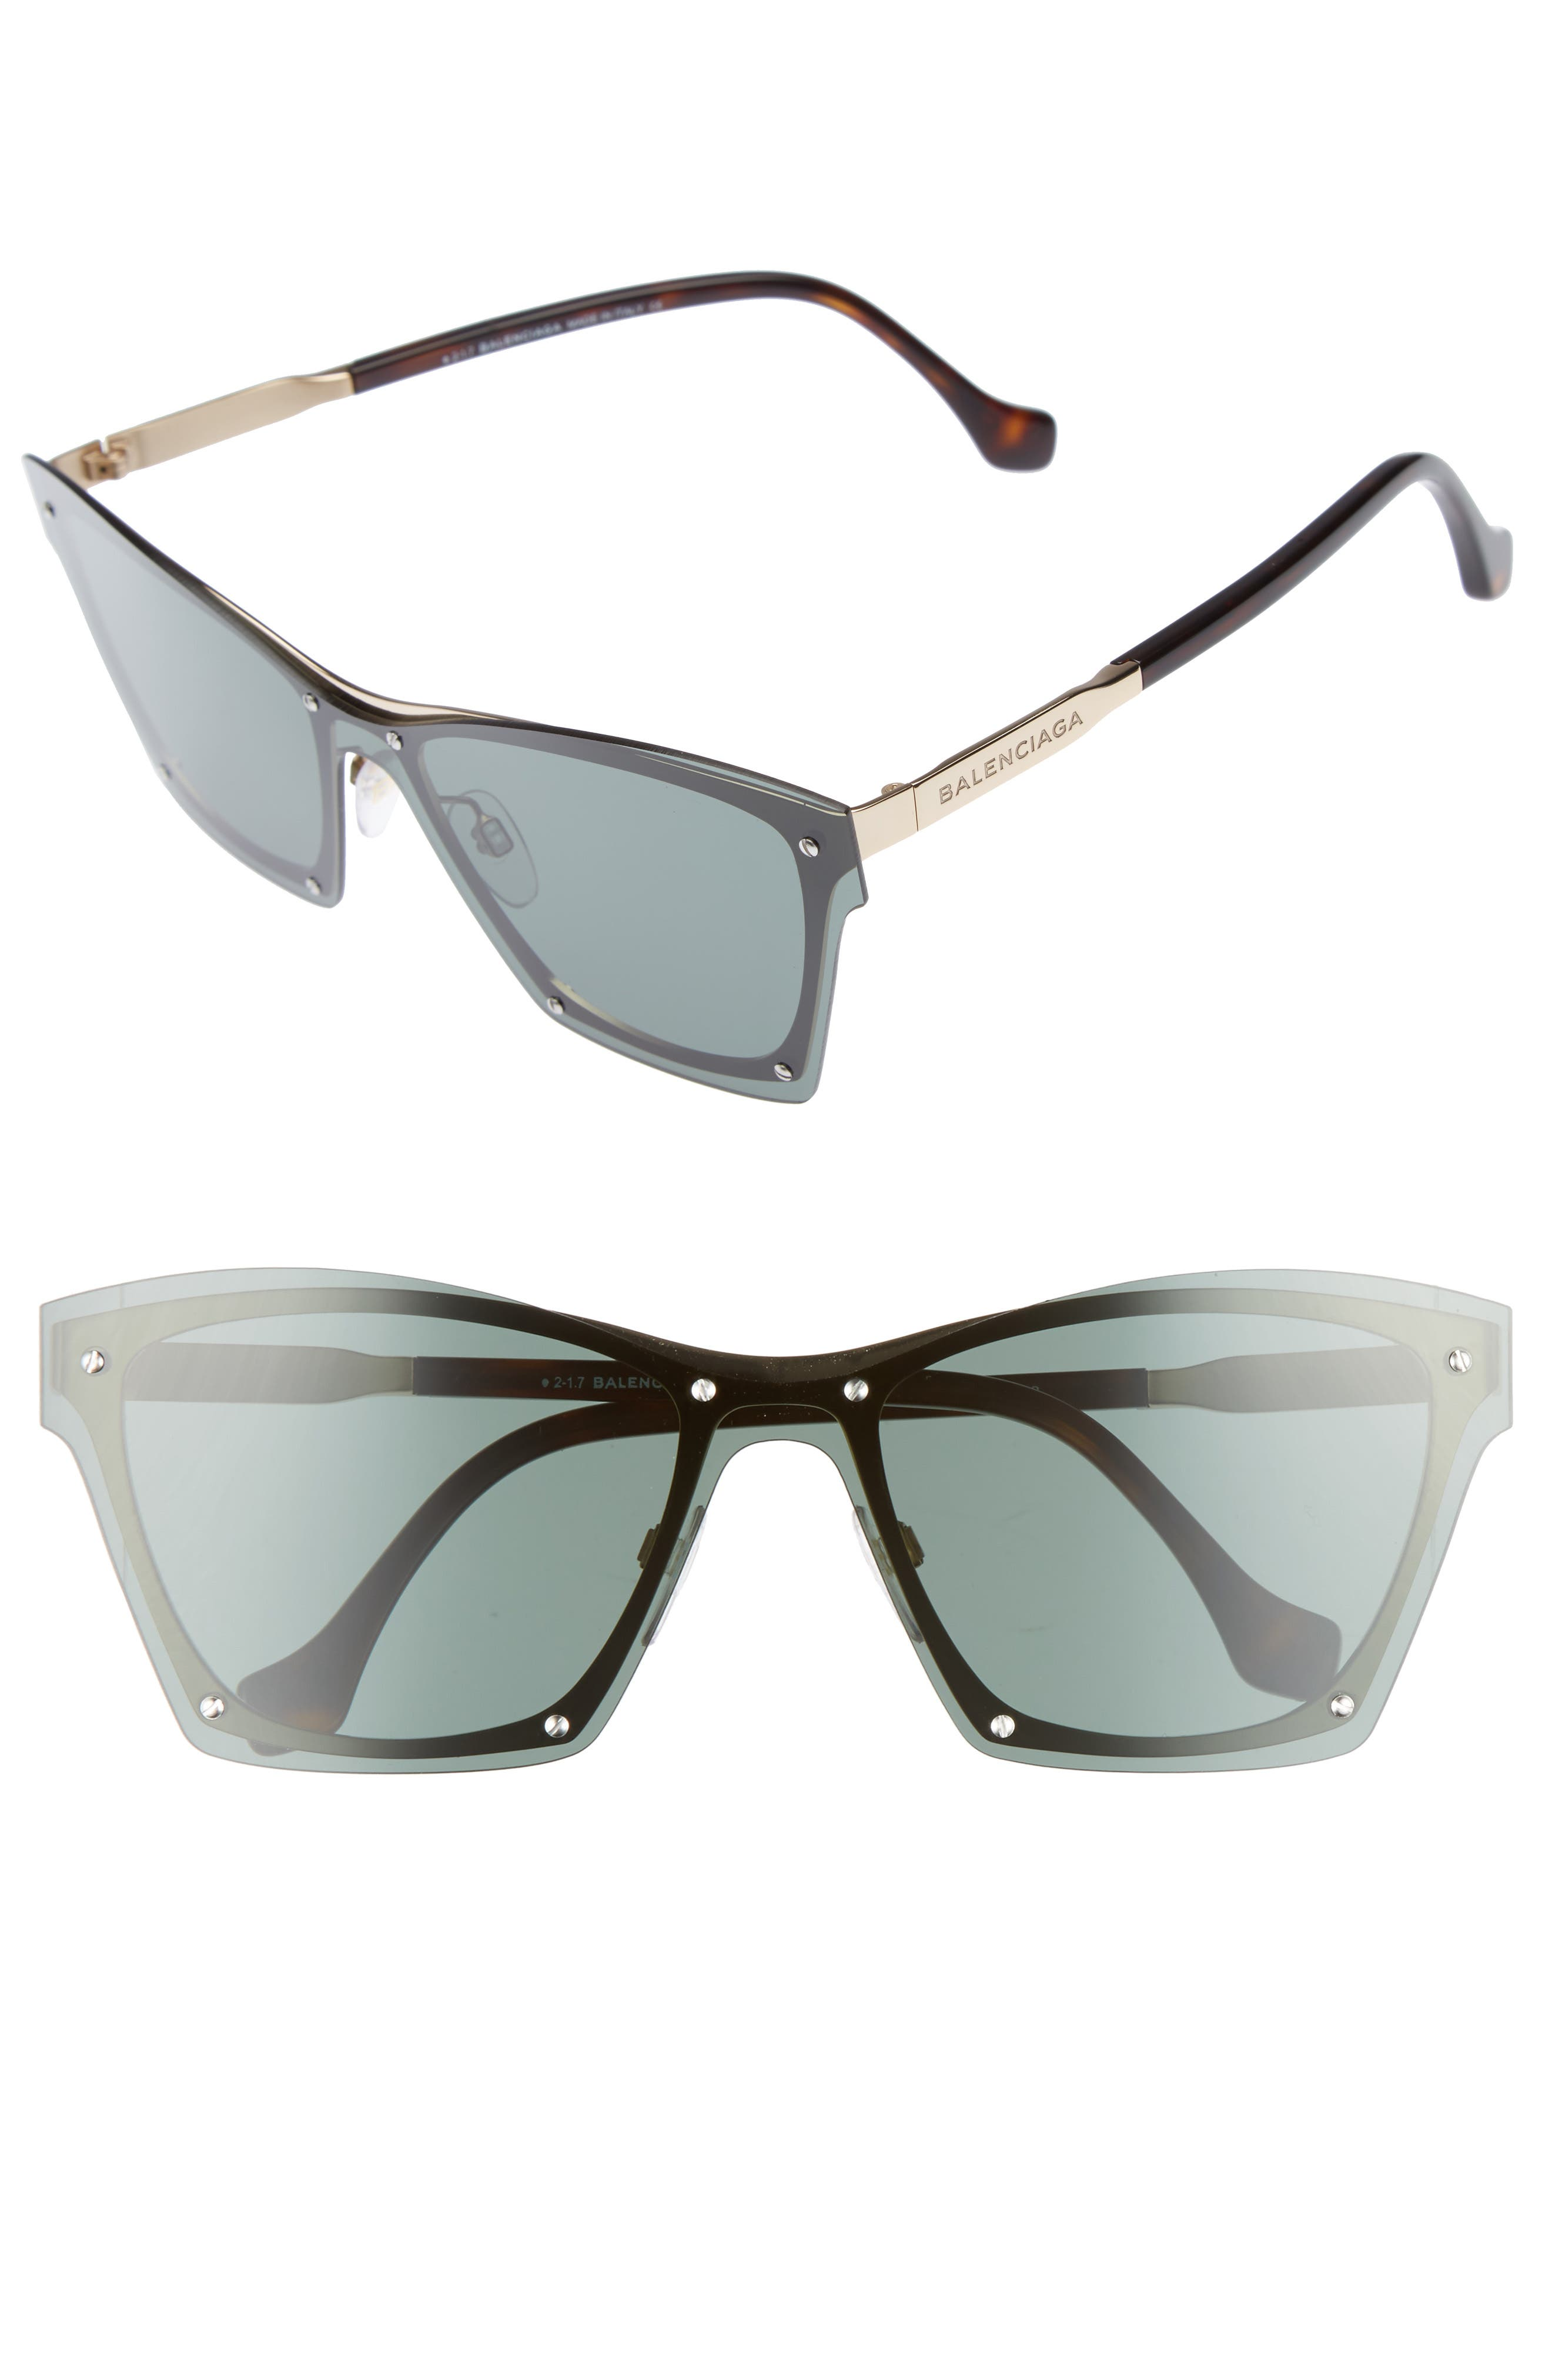 55mm Frameless Sunglasses,                             Main thumbnail 3, color,